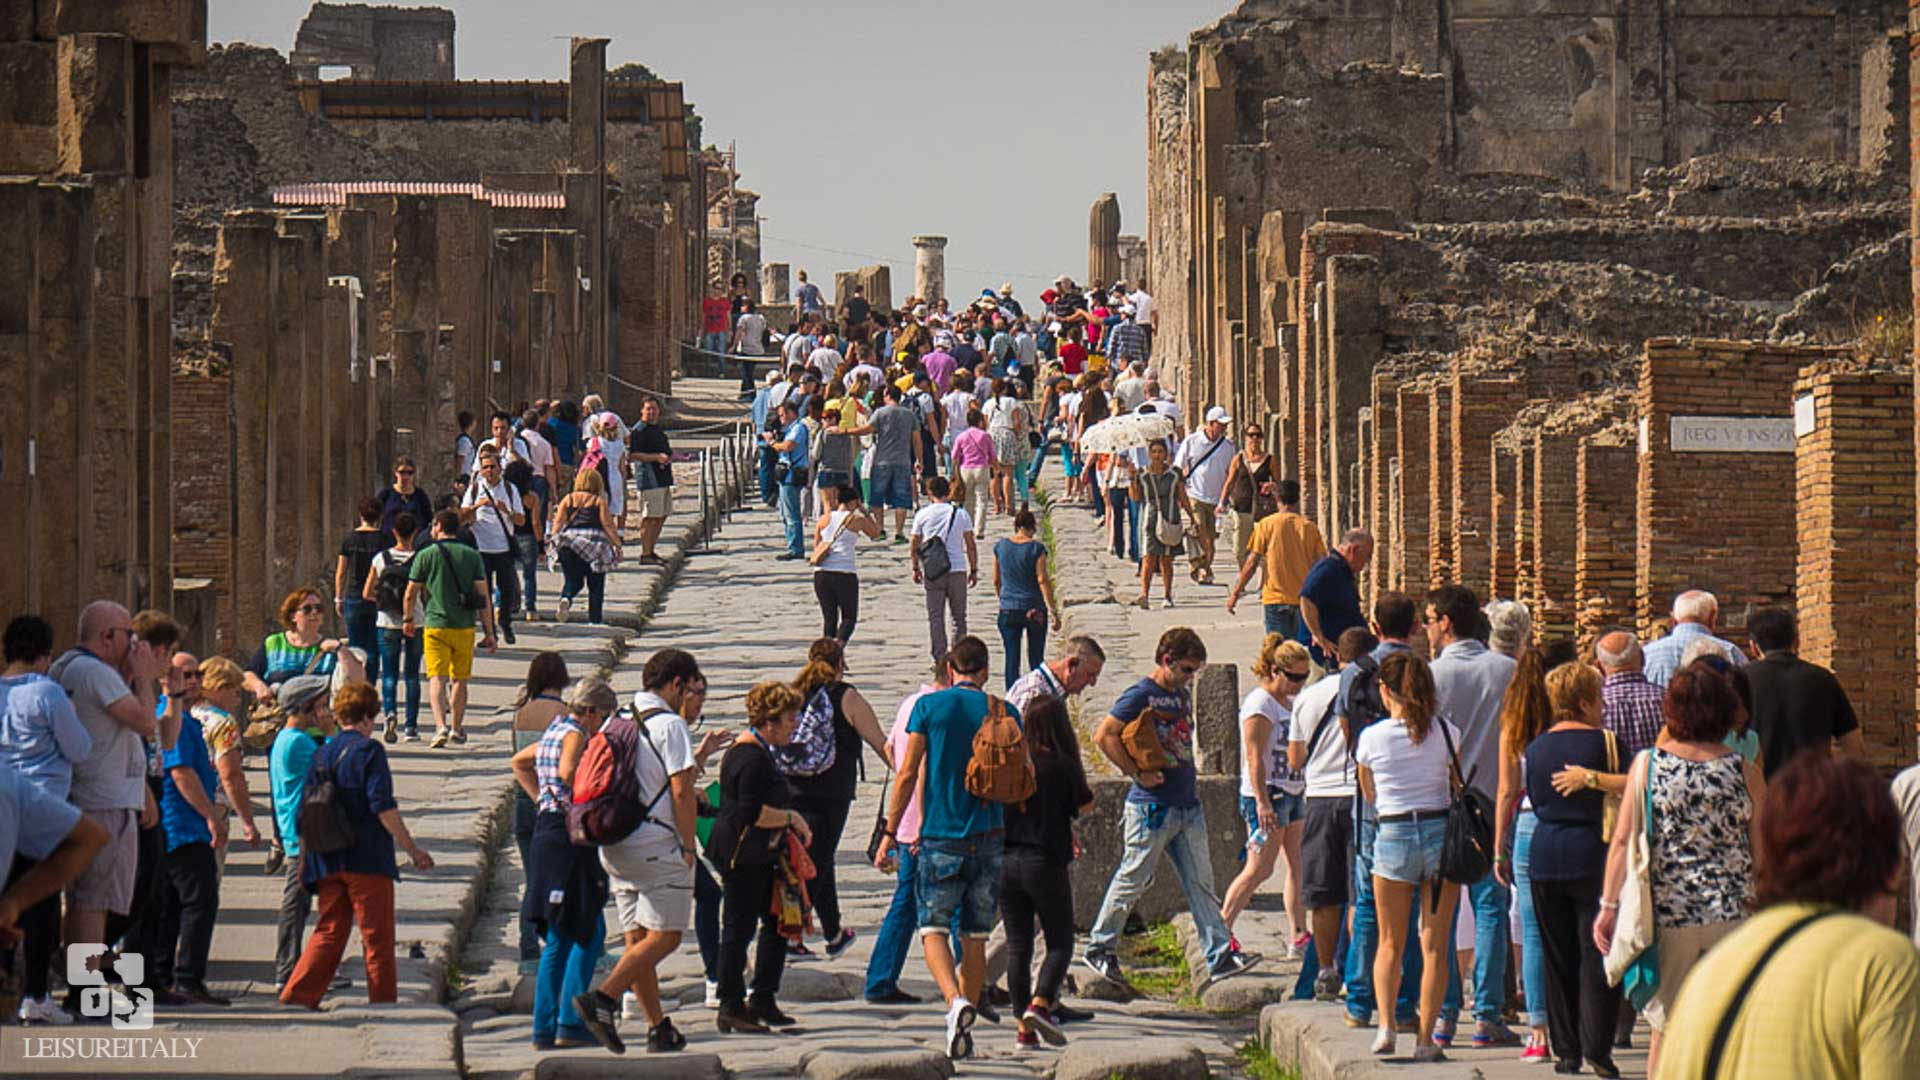 Visit Pompeii - Crowded Pompeii Street